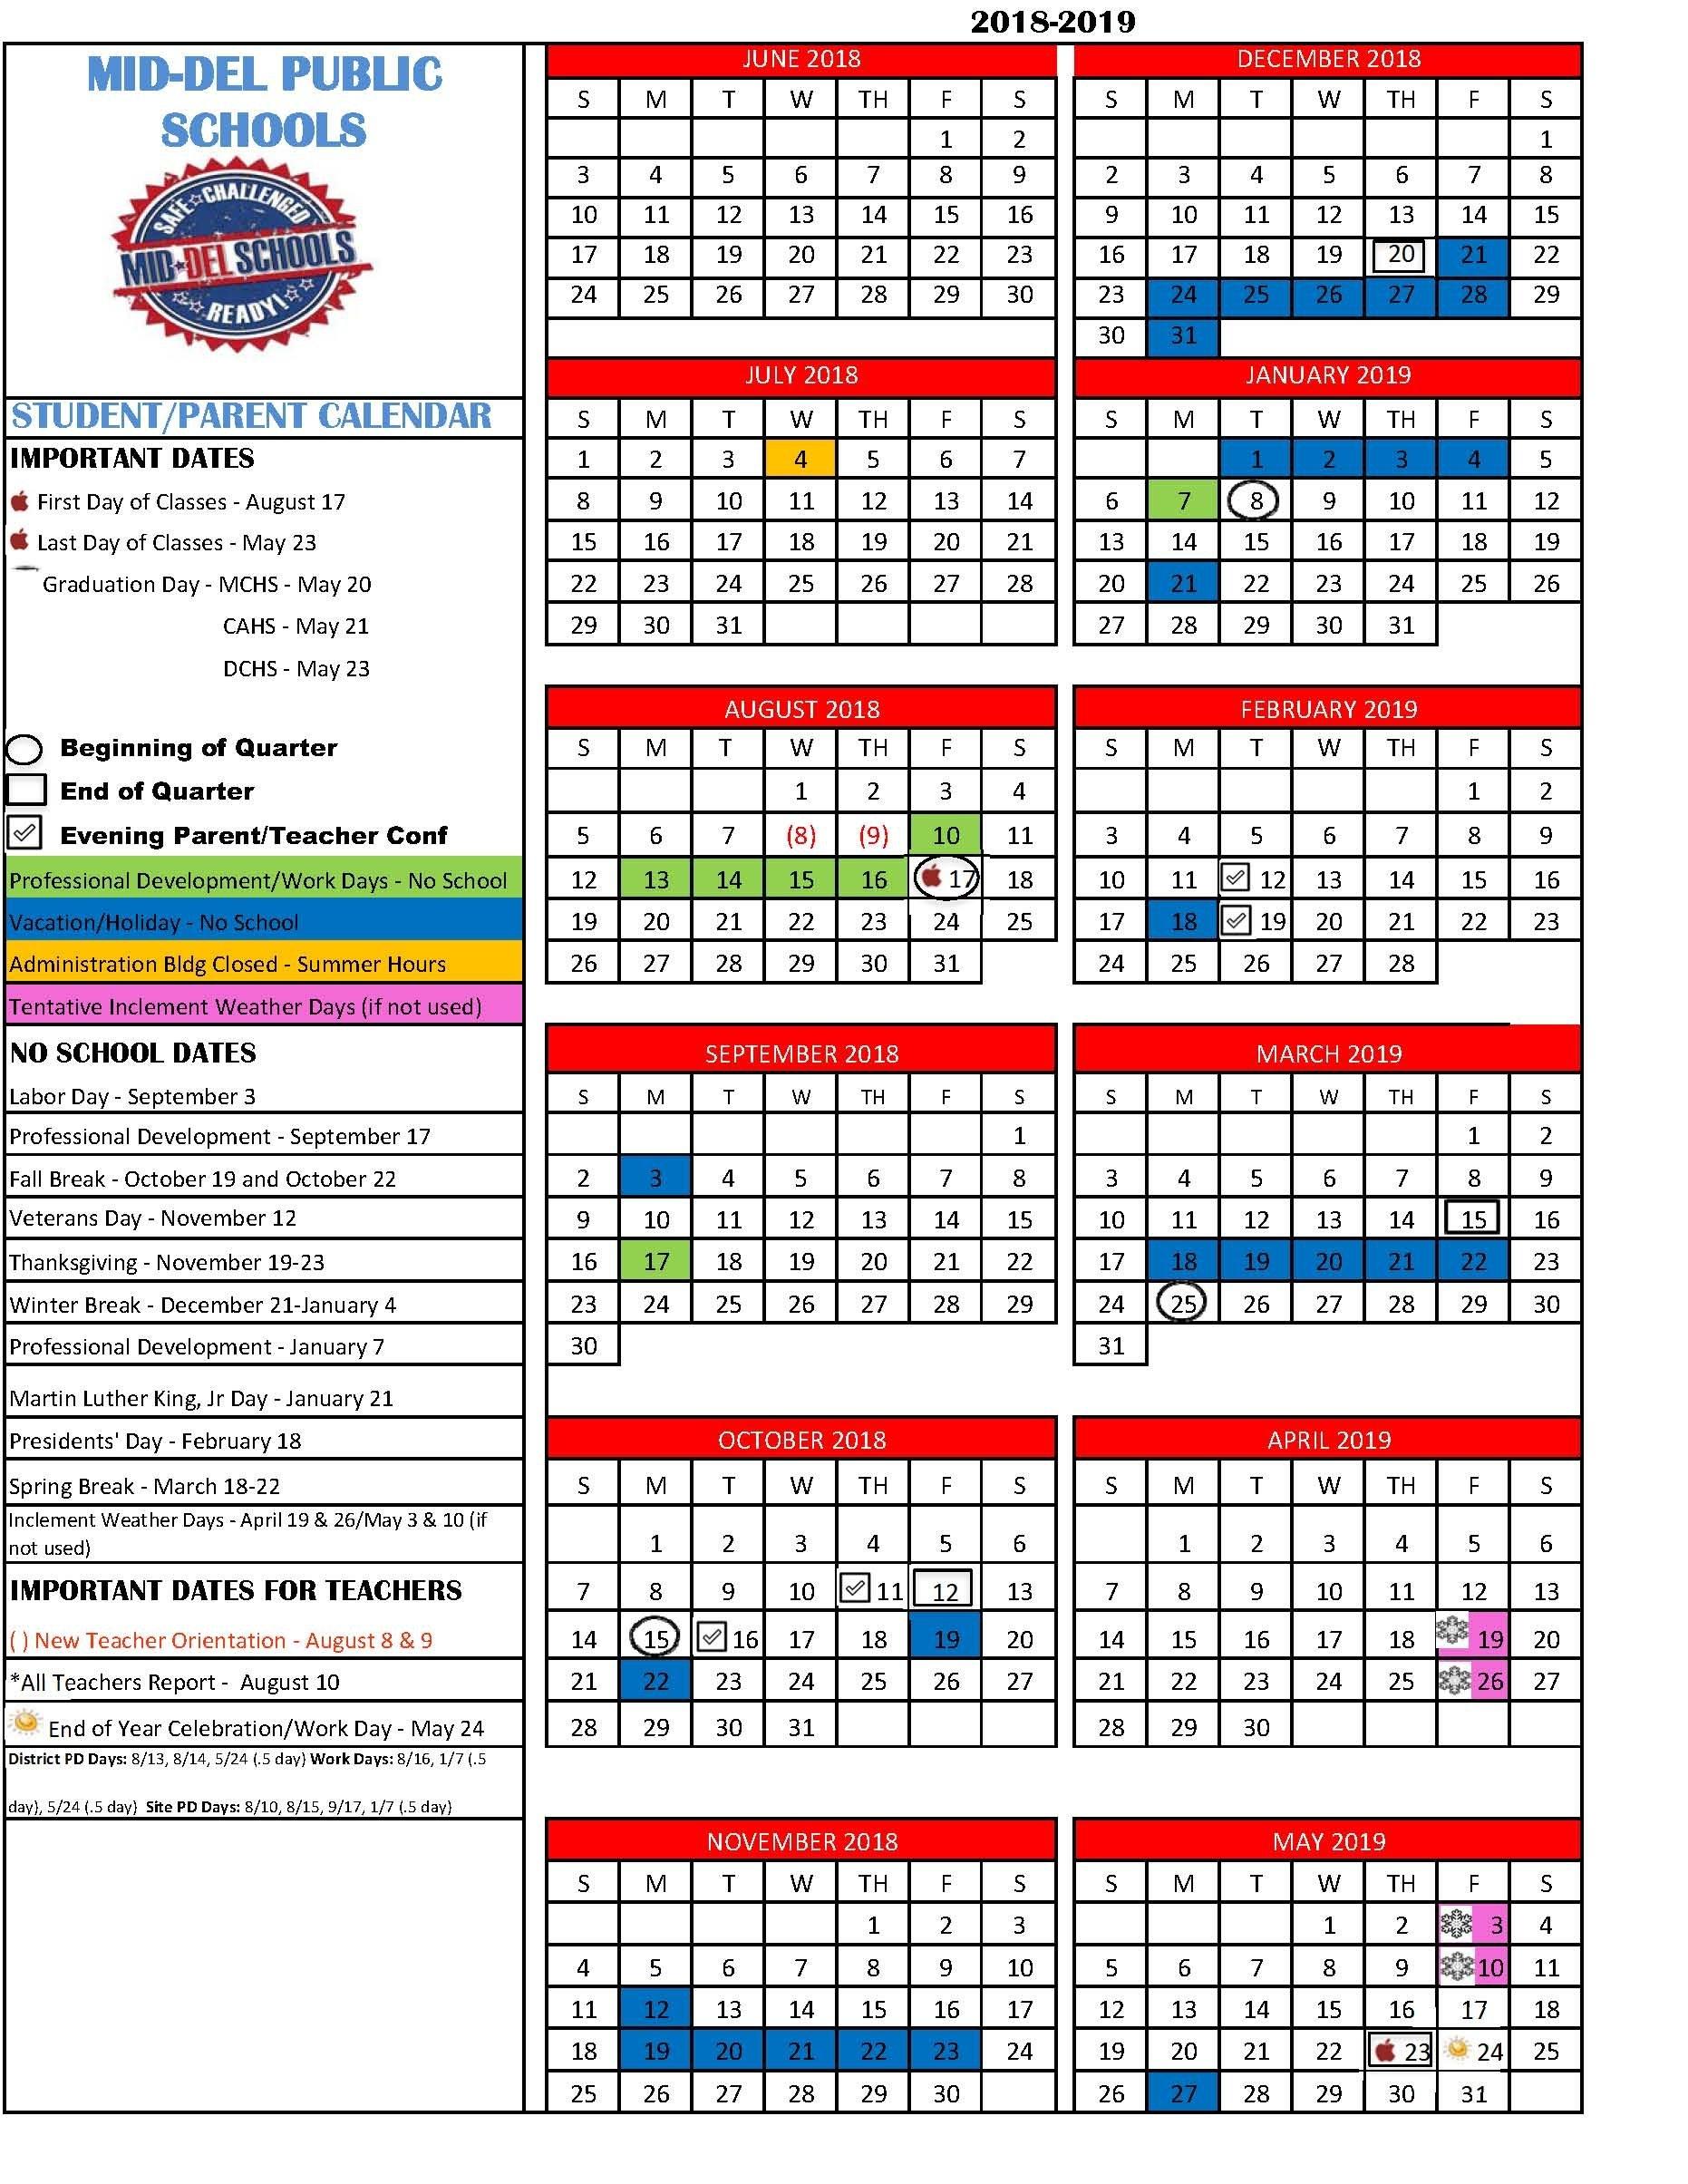 Mid-Del School District Calendar 2019-19